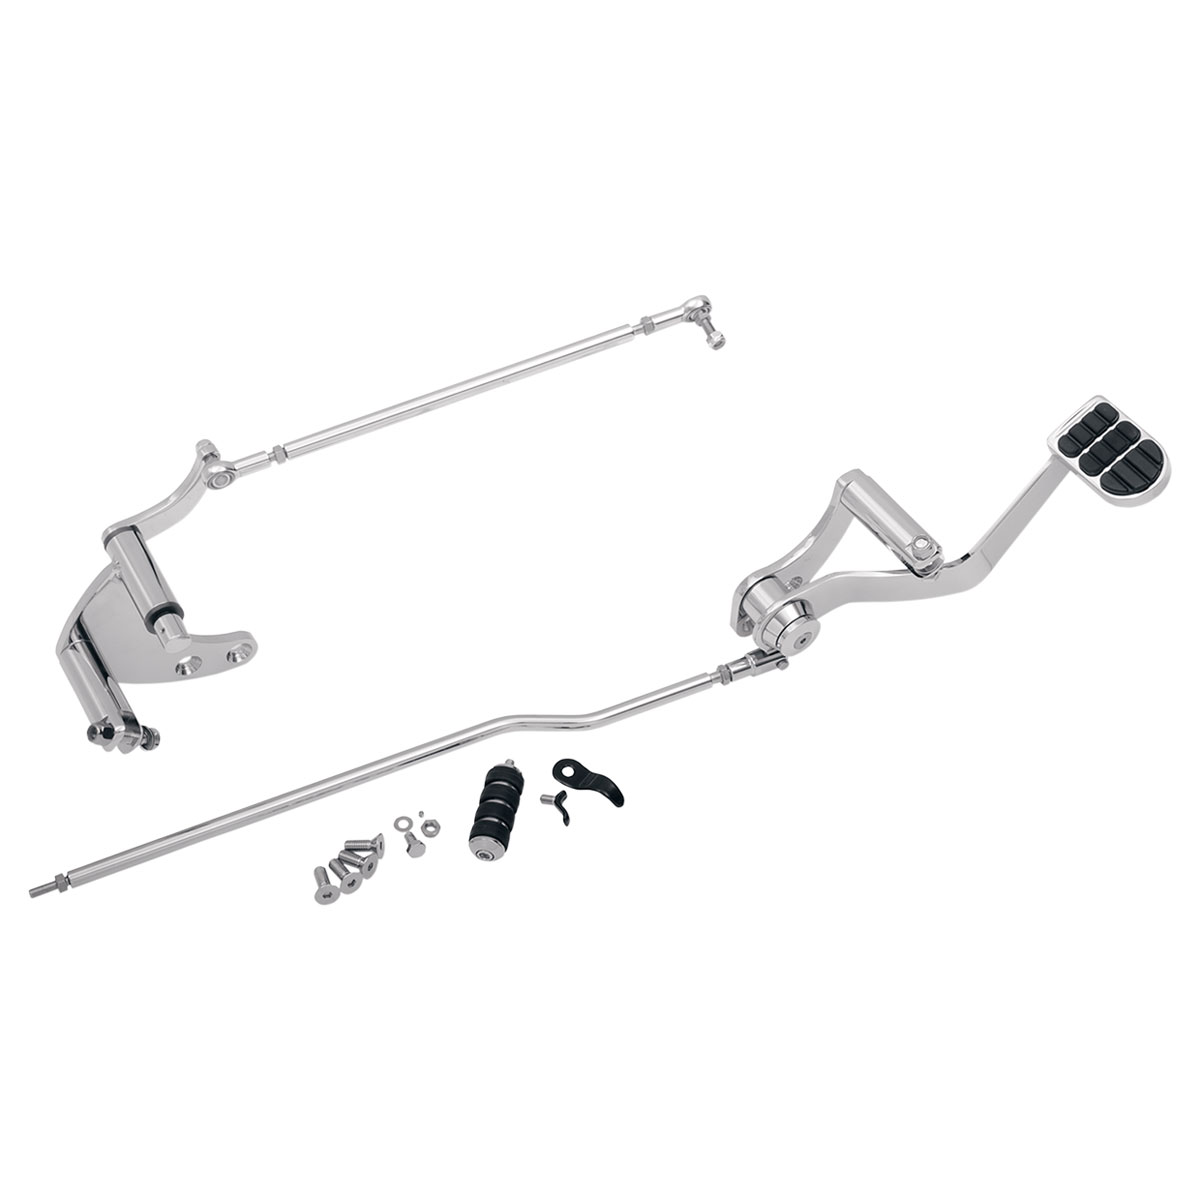 2003 Ford Escape O2 Sensor Location Schematic additionally Wiring Diagram For Pressure Washer further Dodge Neon Camshaft Sensor Location also Spark Plug Location On 2002 Trailblazer further 1999 Honda Fuse Box Diagram. on 2008 jeep grand cherokee radio wiring diagram